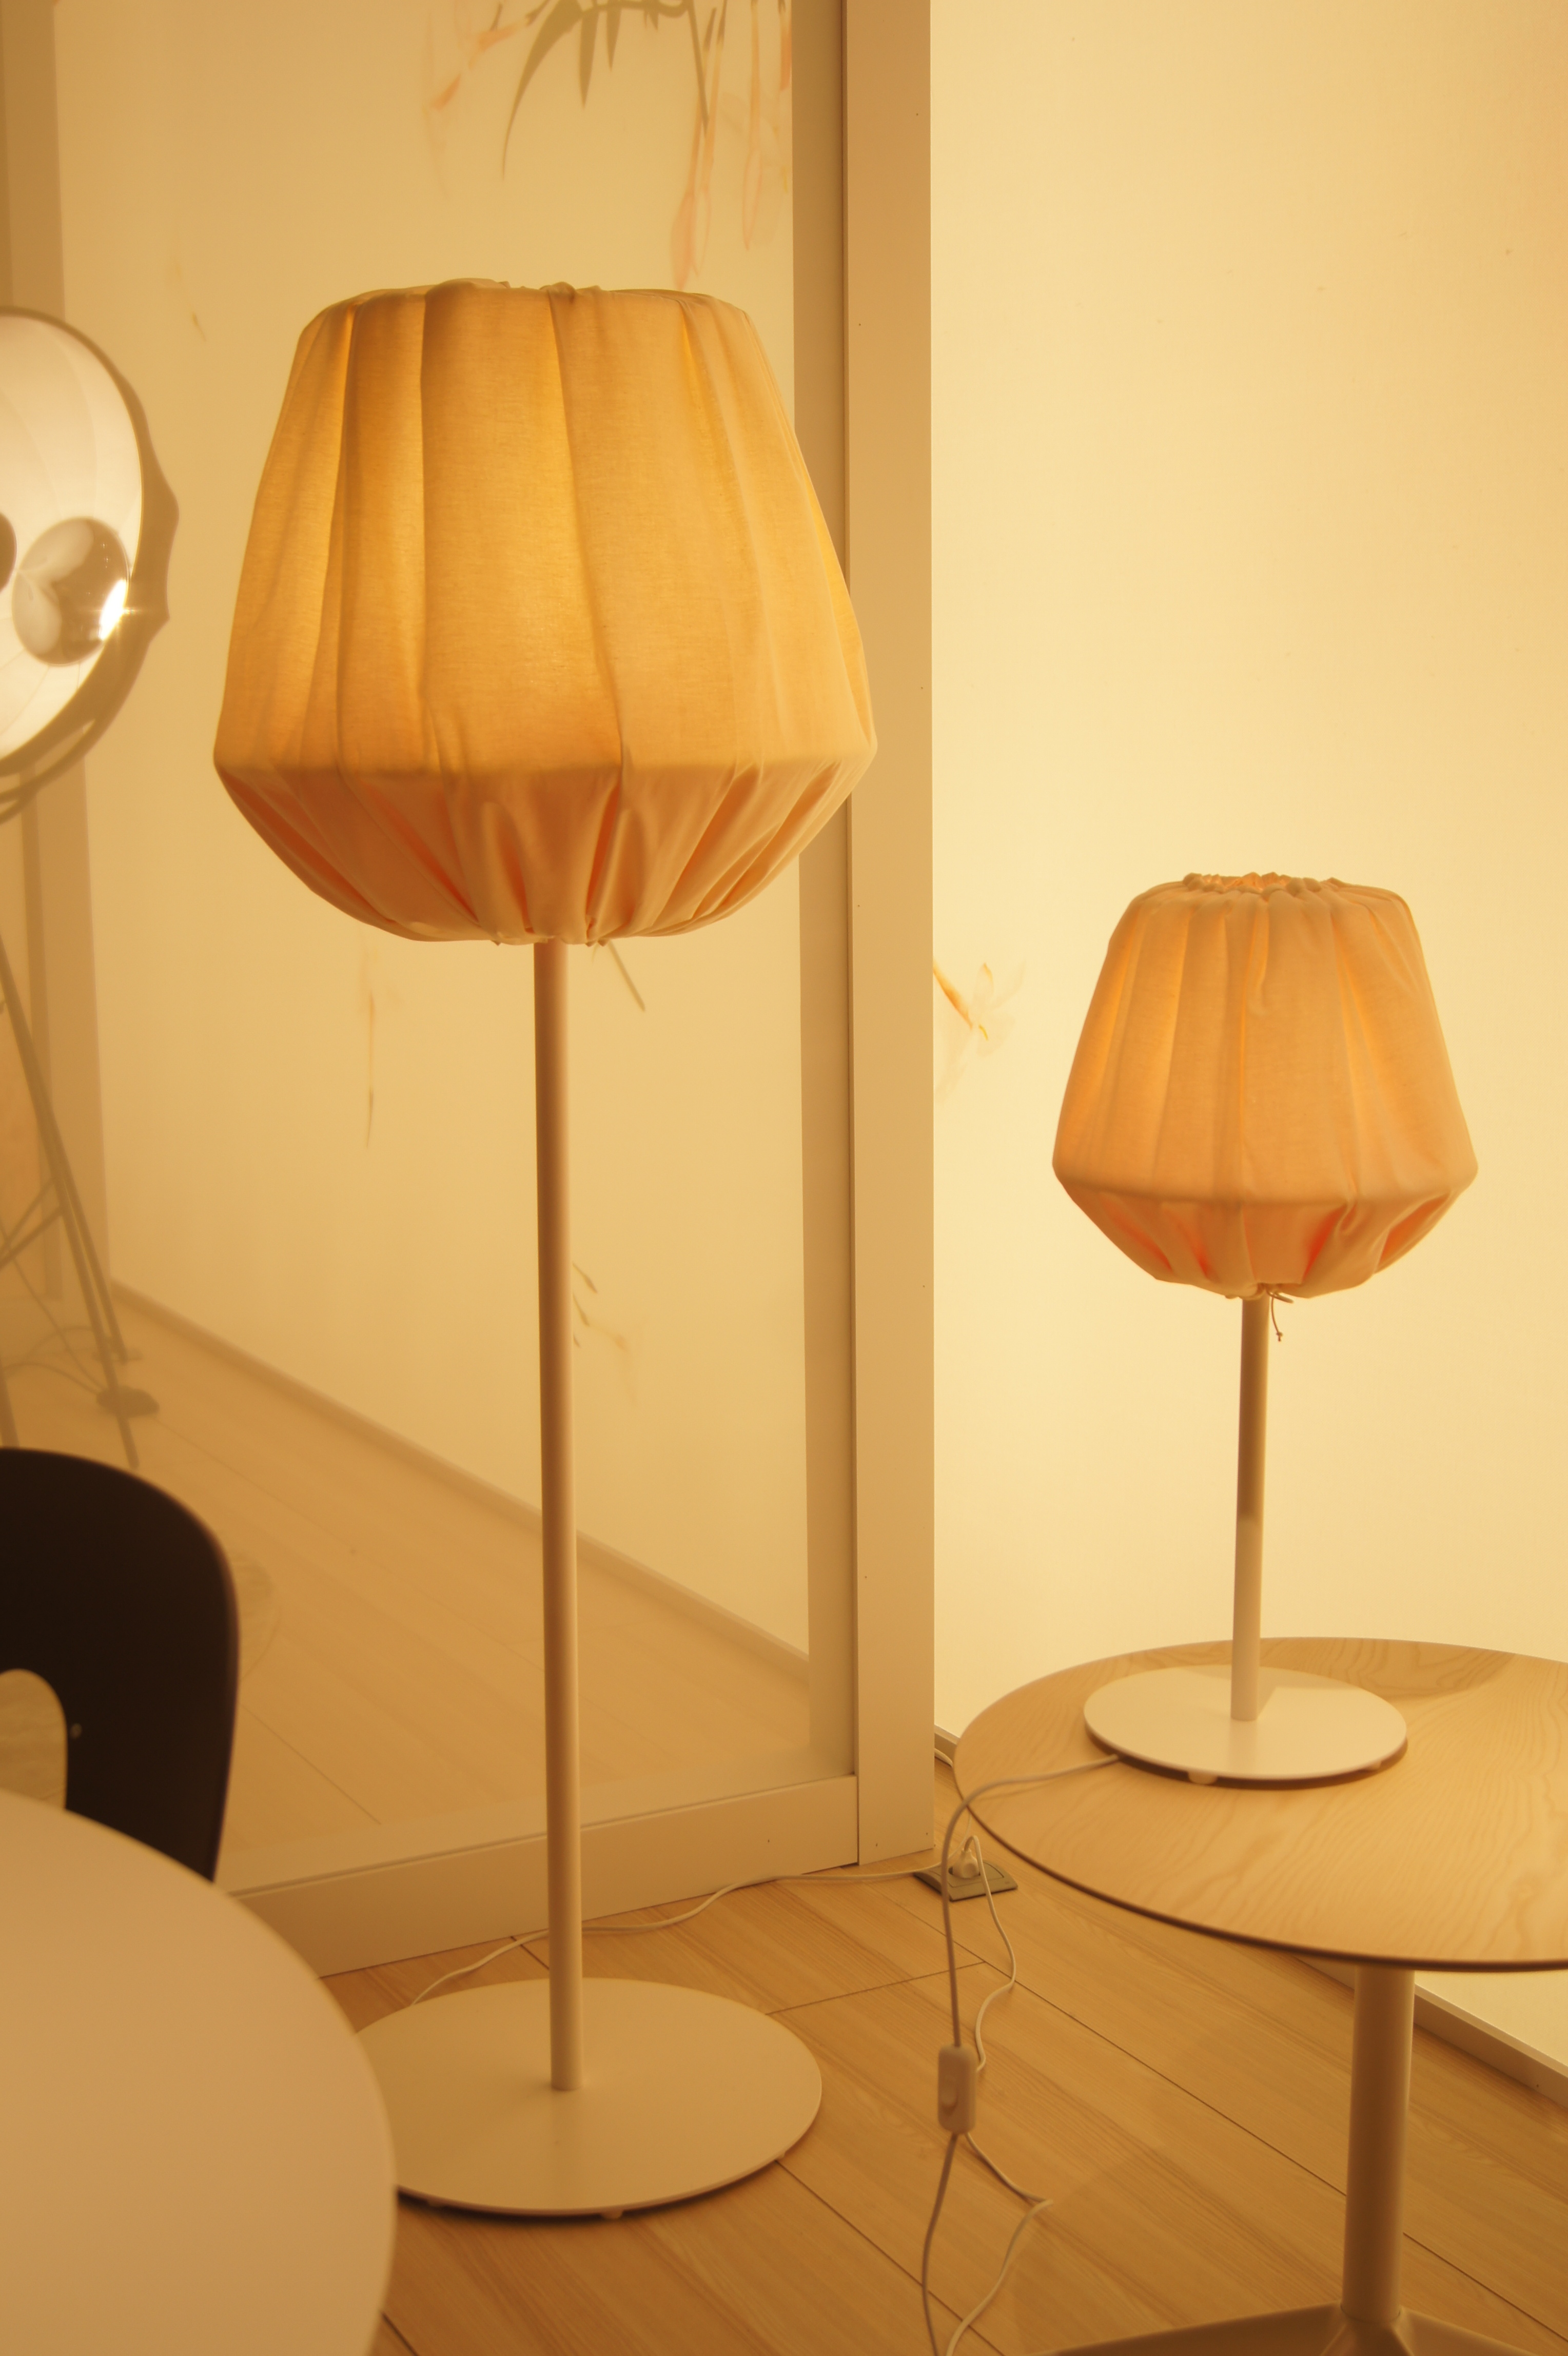 Verlichting van Stua | Salone del Mobile